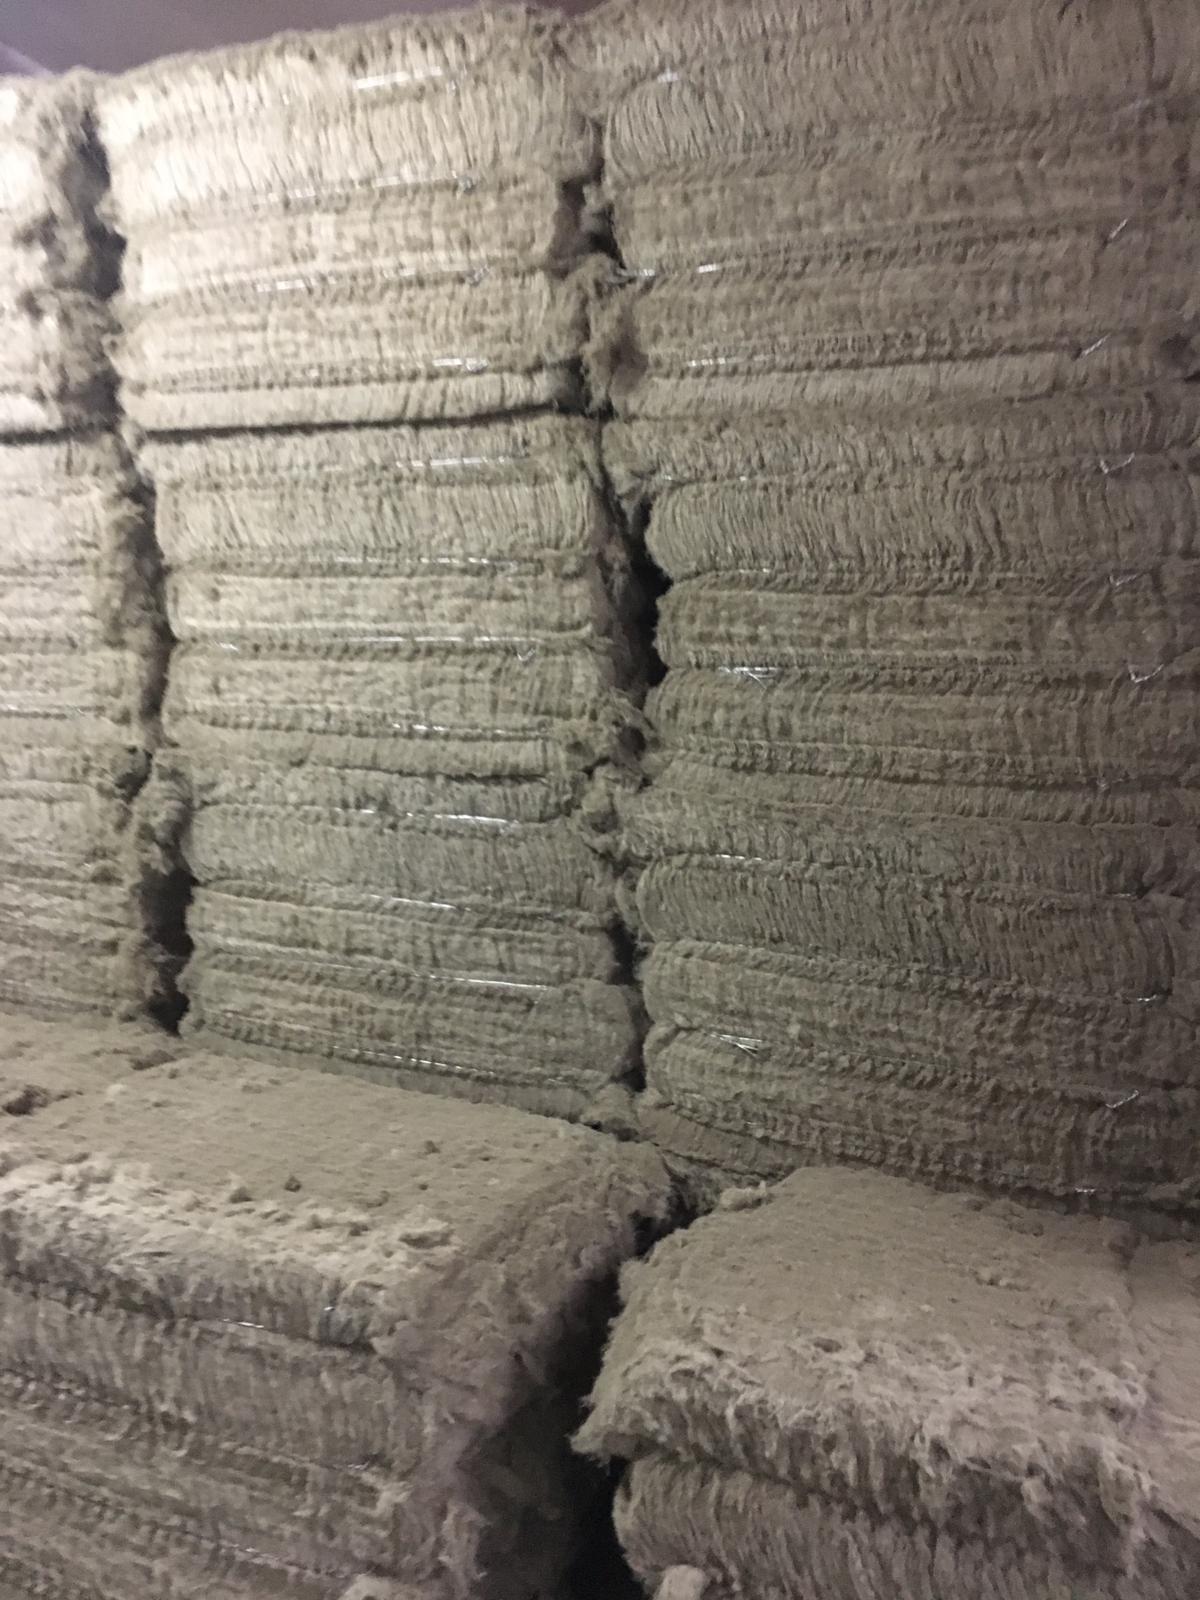 Cottonized fiber 3